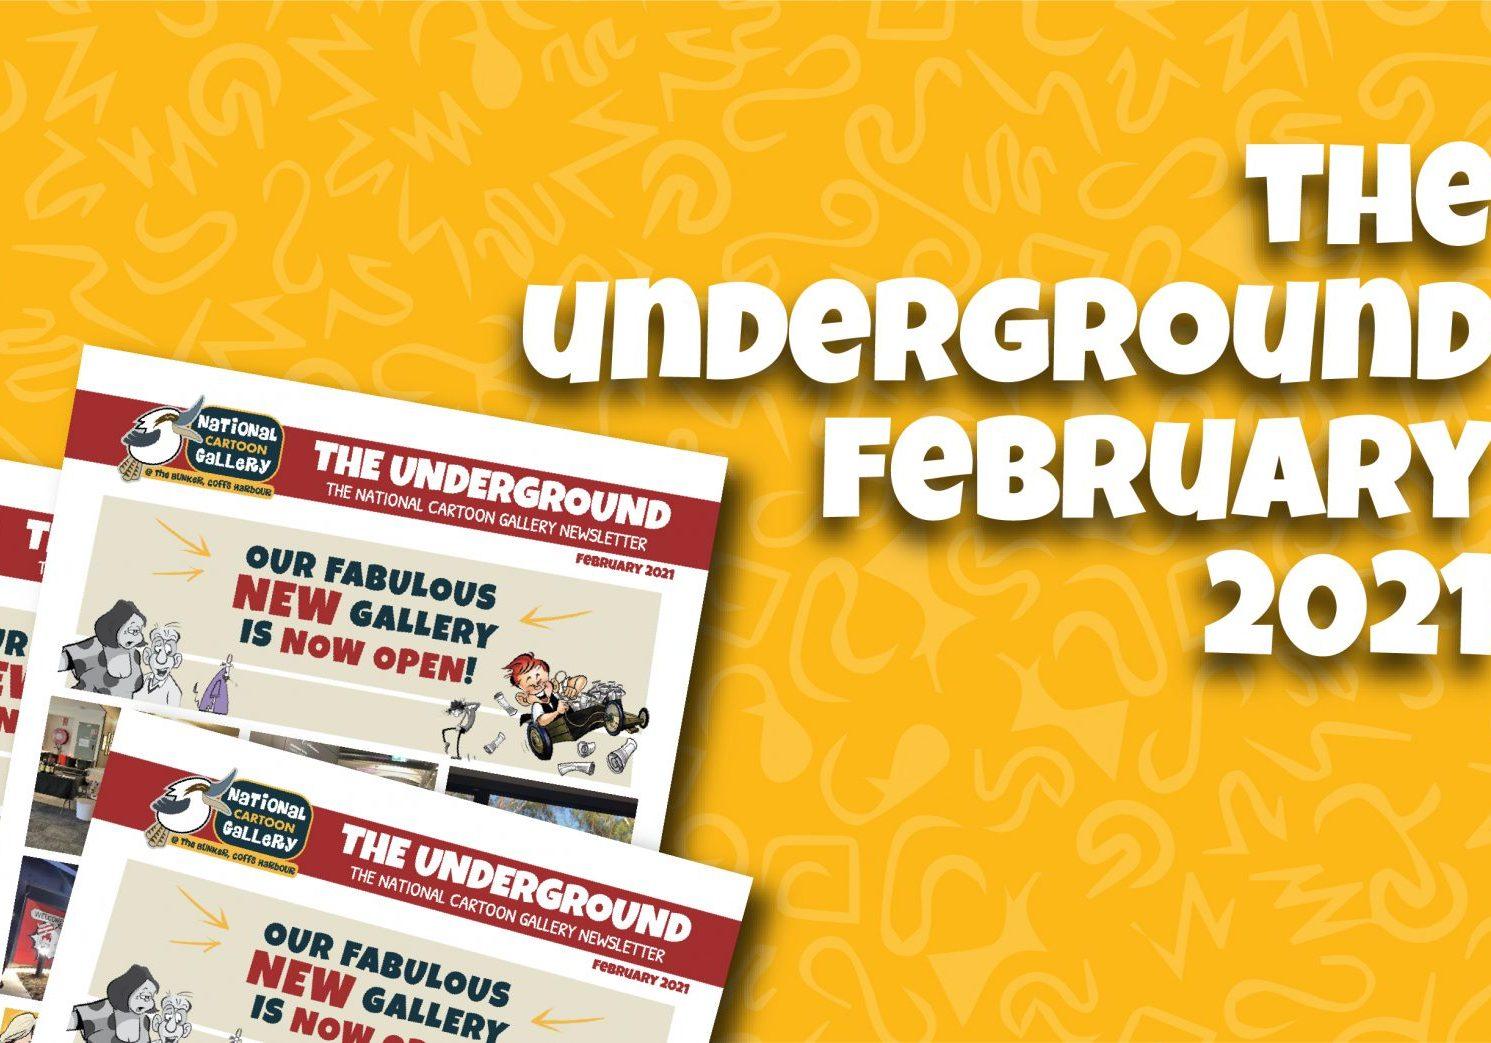 Underground February_2021_Website-02